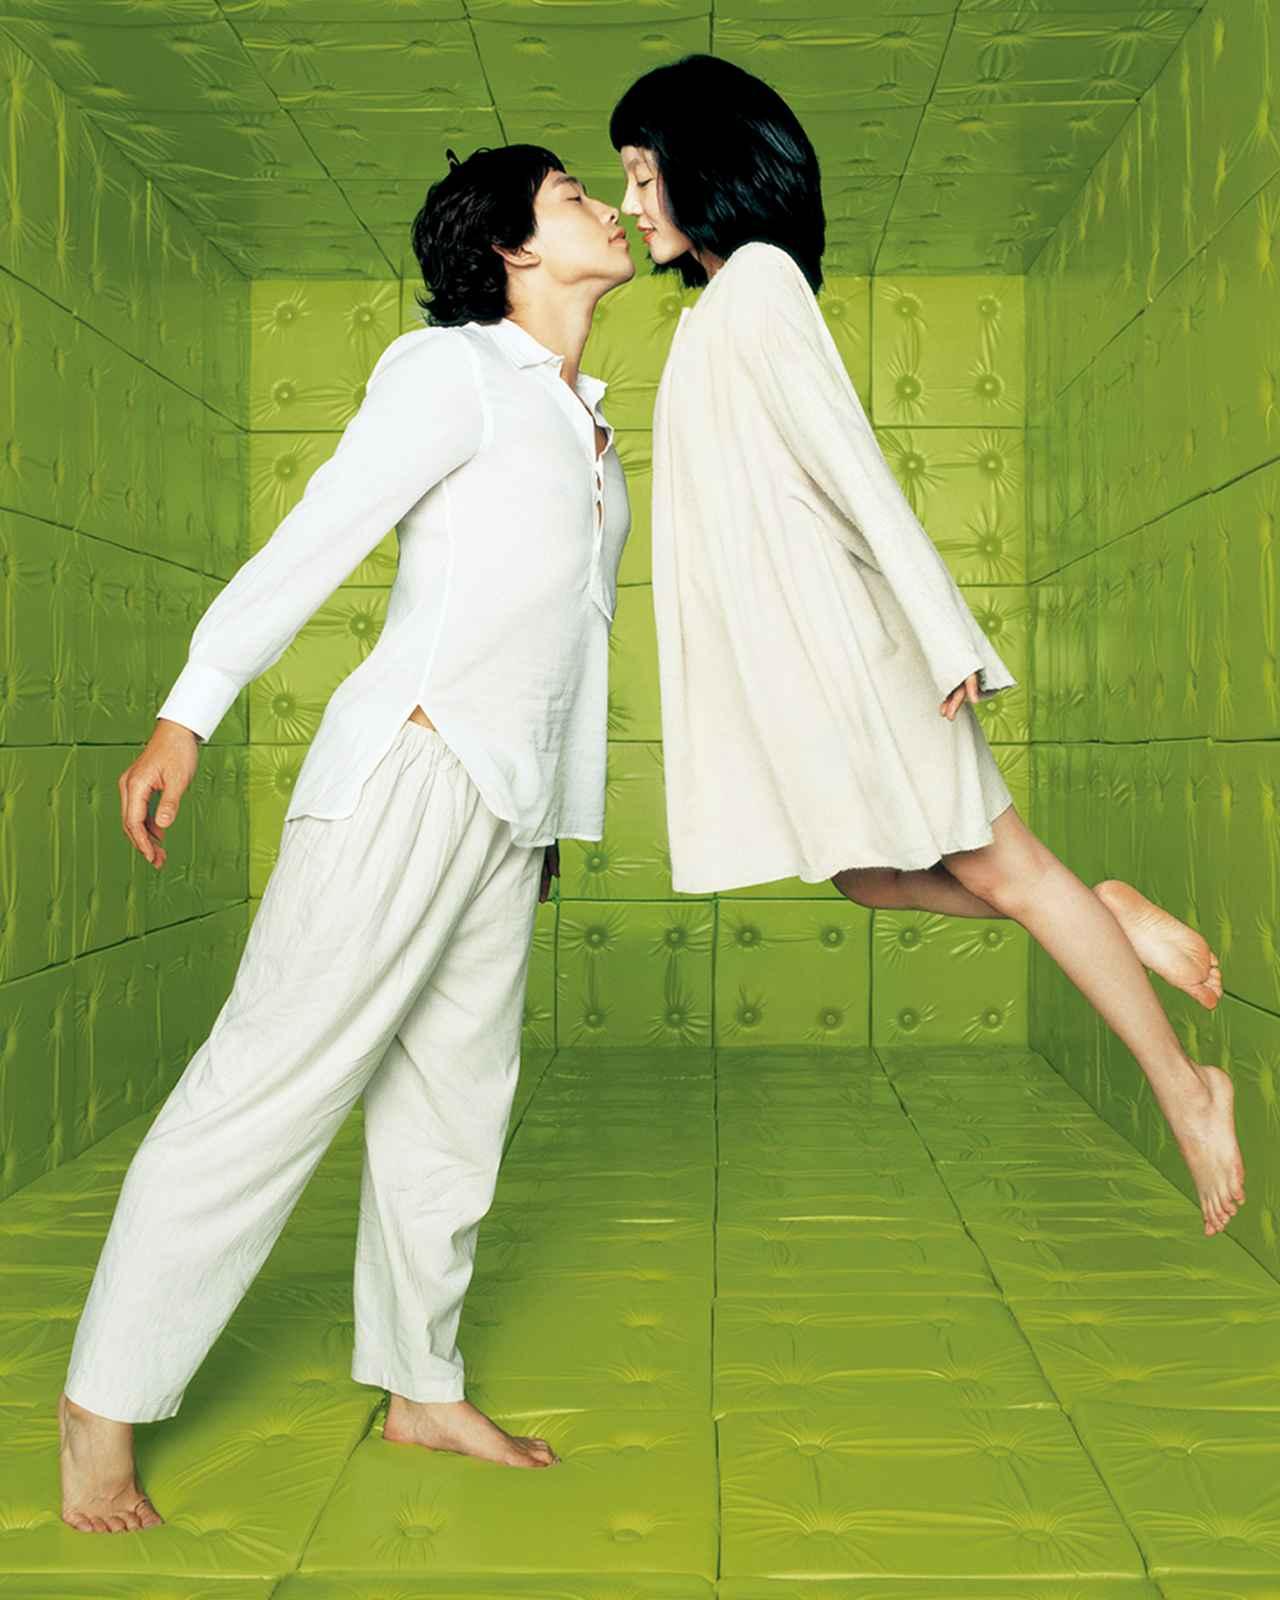 Images : 2番目の画像 - 「復讐映画の巨匠、パク・チャヌク その知られざる素顔<後編>」のアルバム - T JAPAN:The New York Times Style Magazine 公式サイト